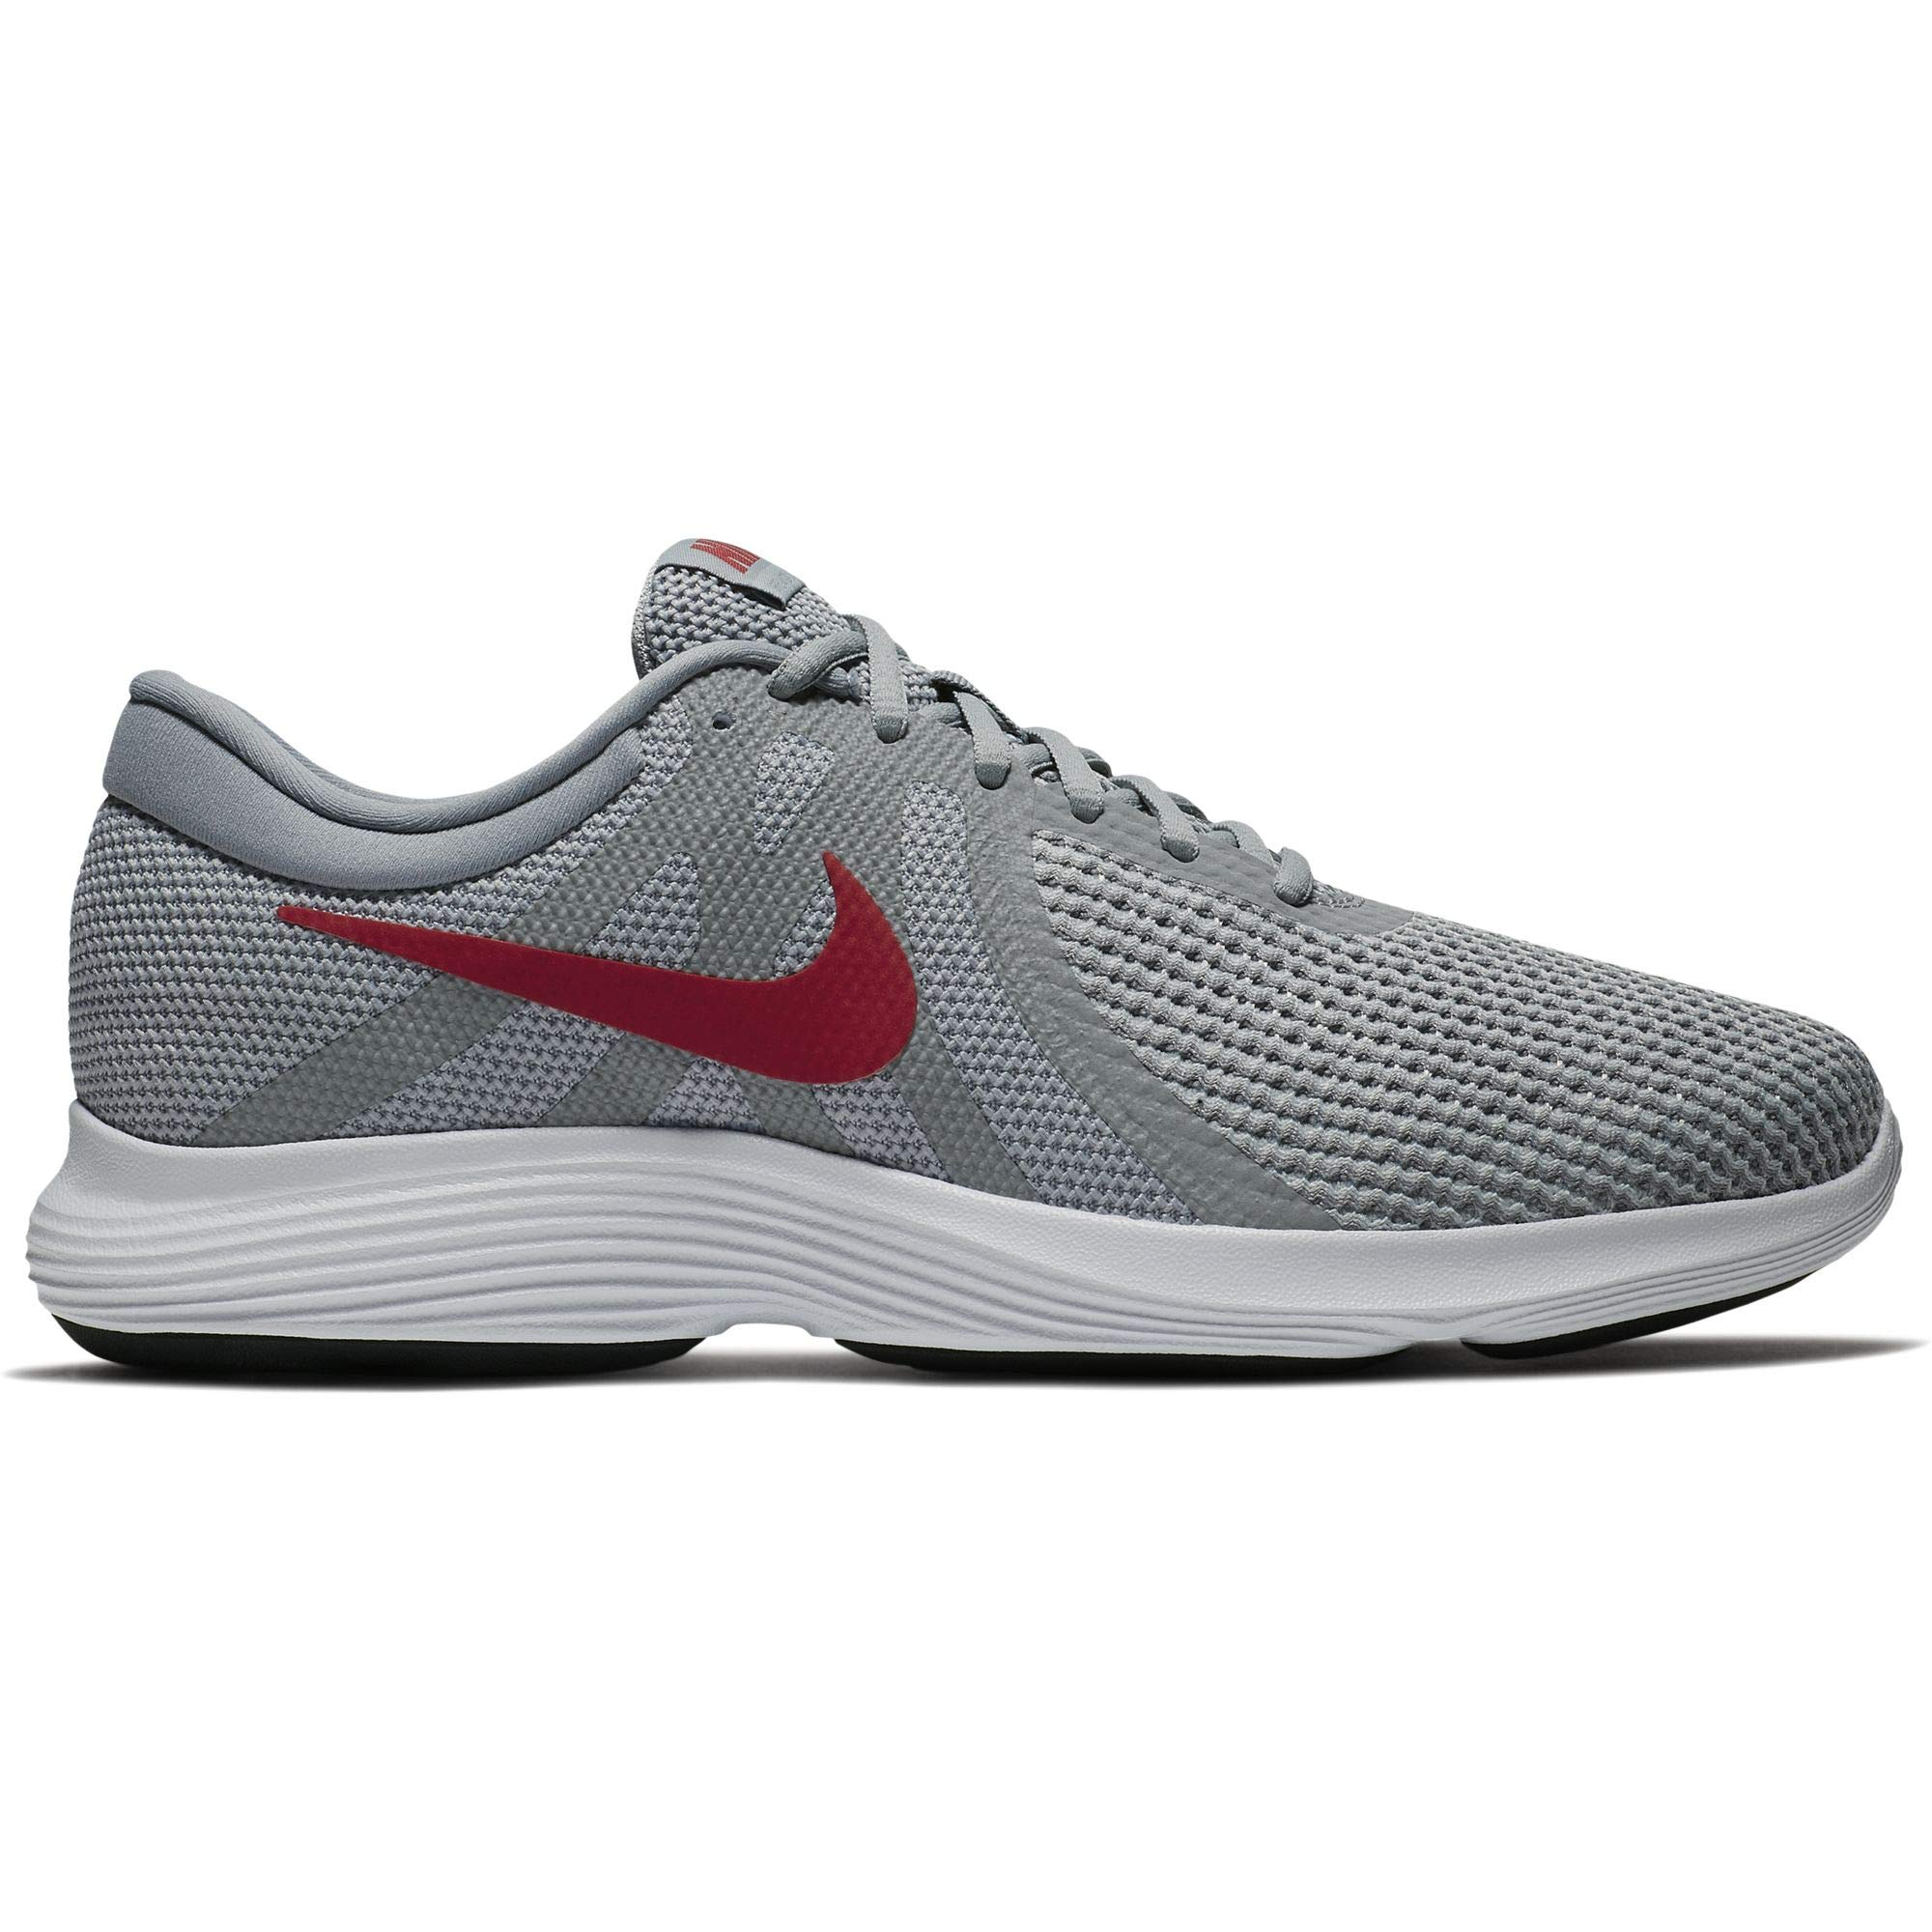 5dc85021116c0 Galleon - Nike Men s Revolution 4 Running Shoe